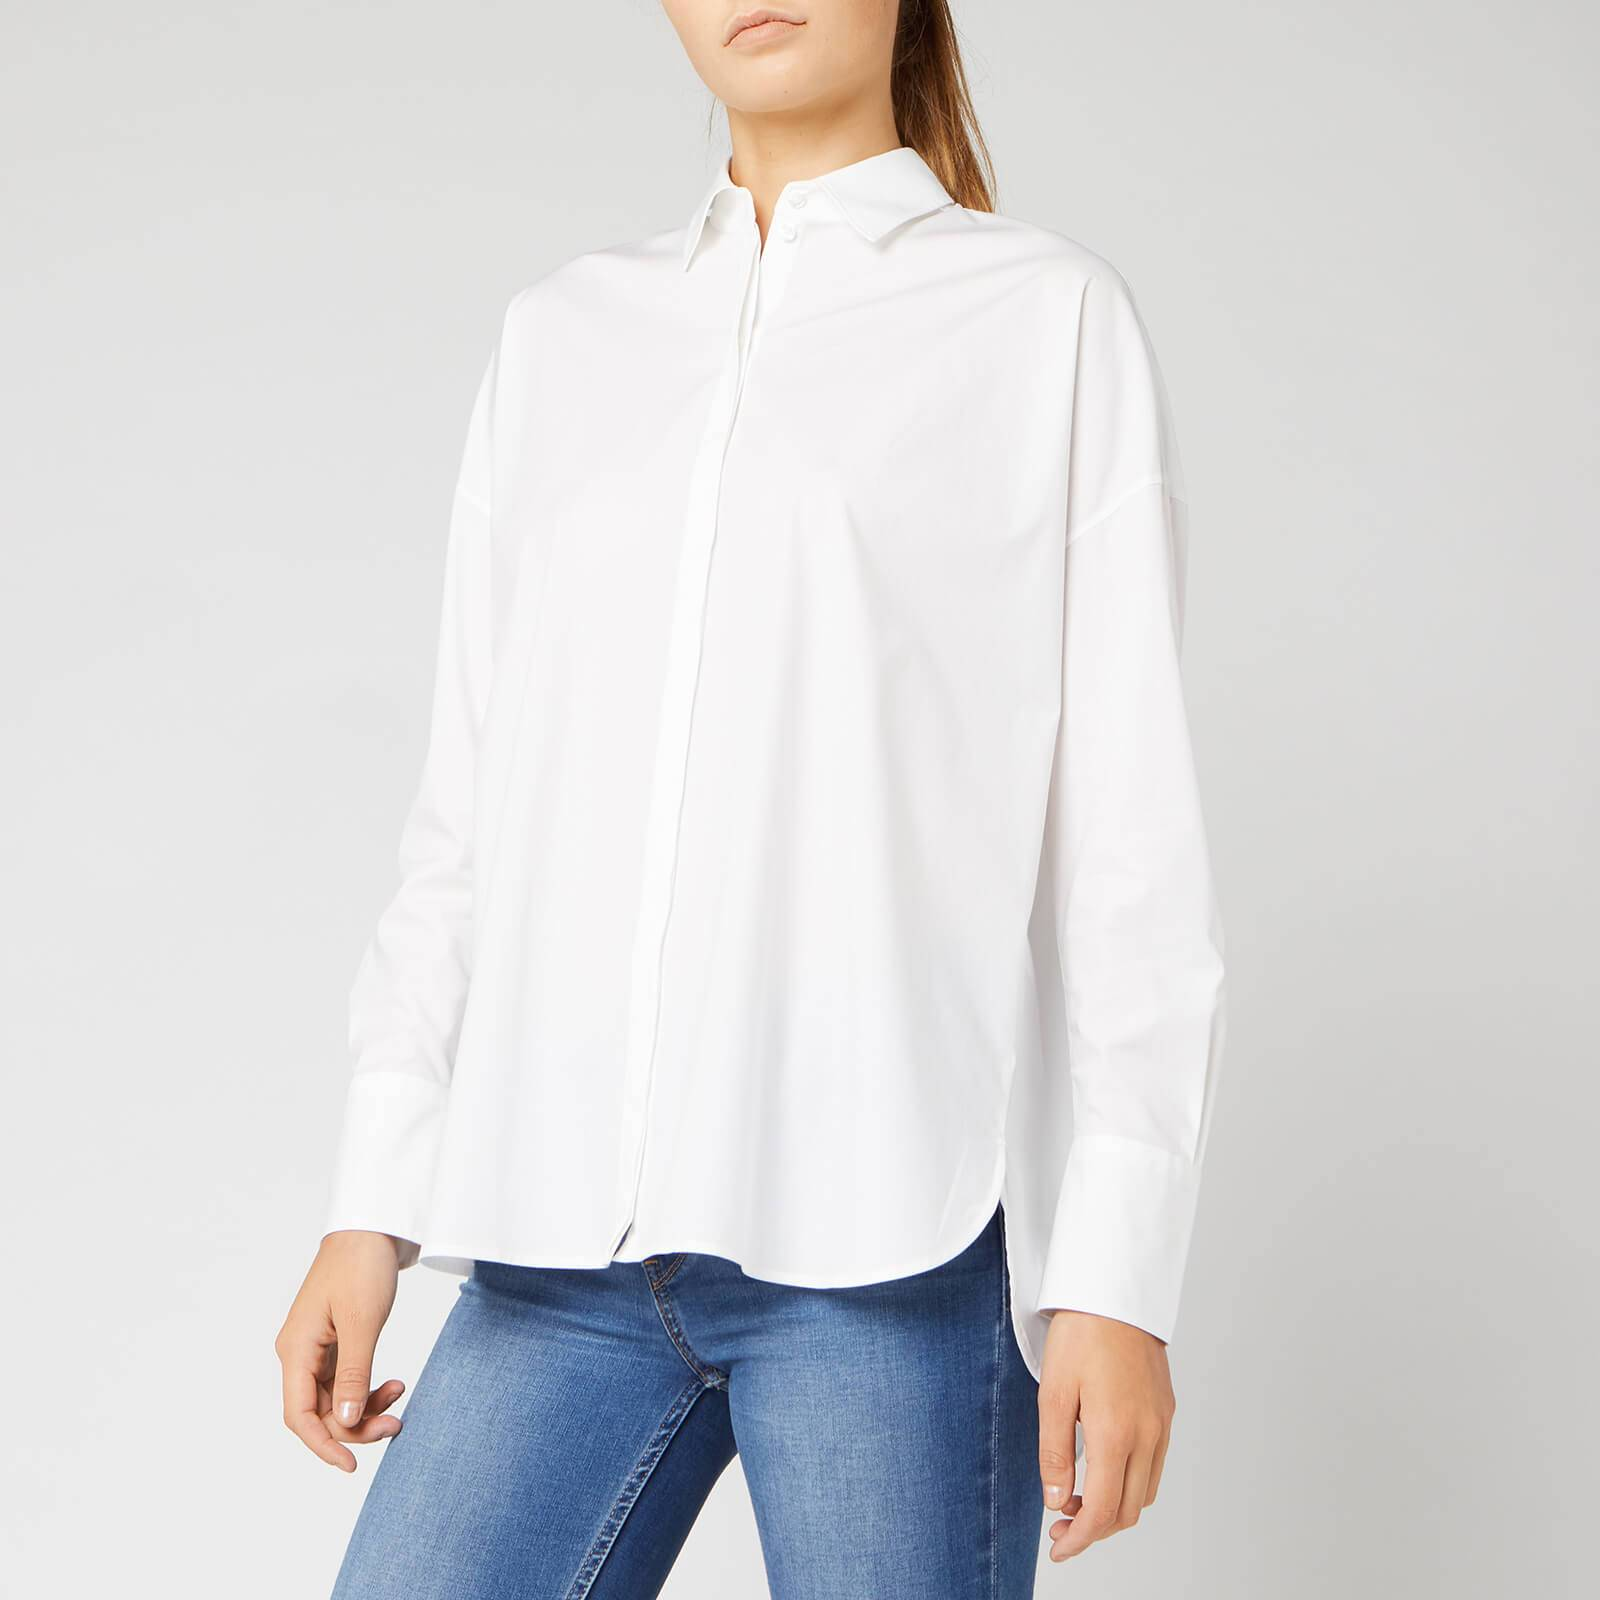 Hugo Boss Women's Elumia Shirt - White - M - White